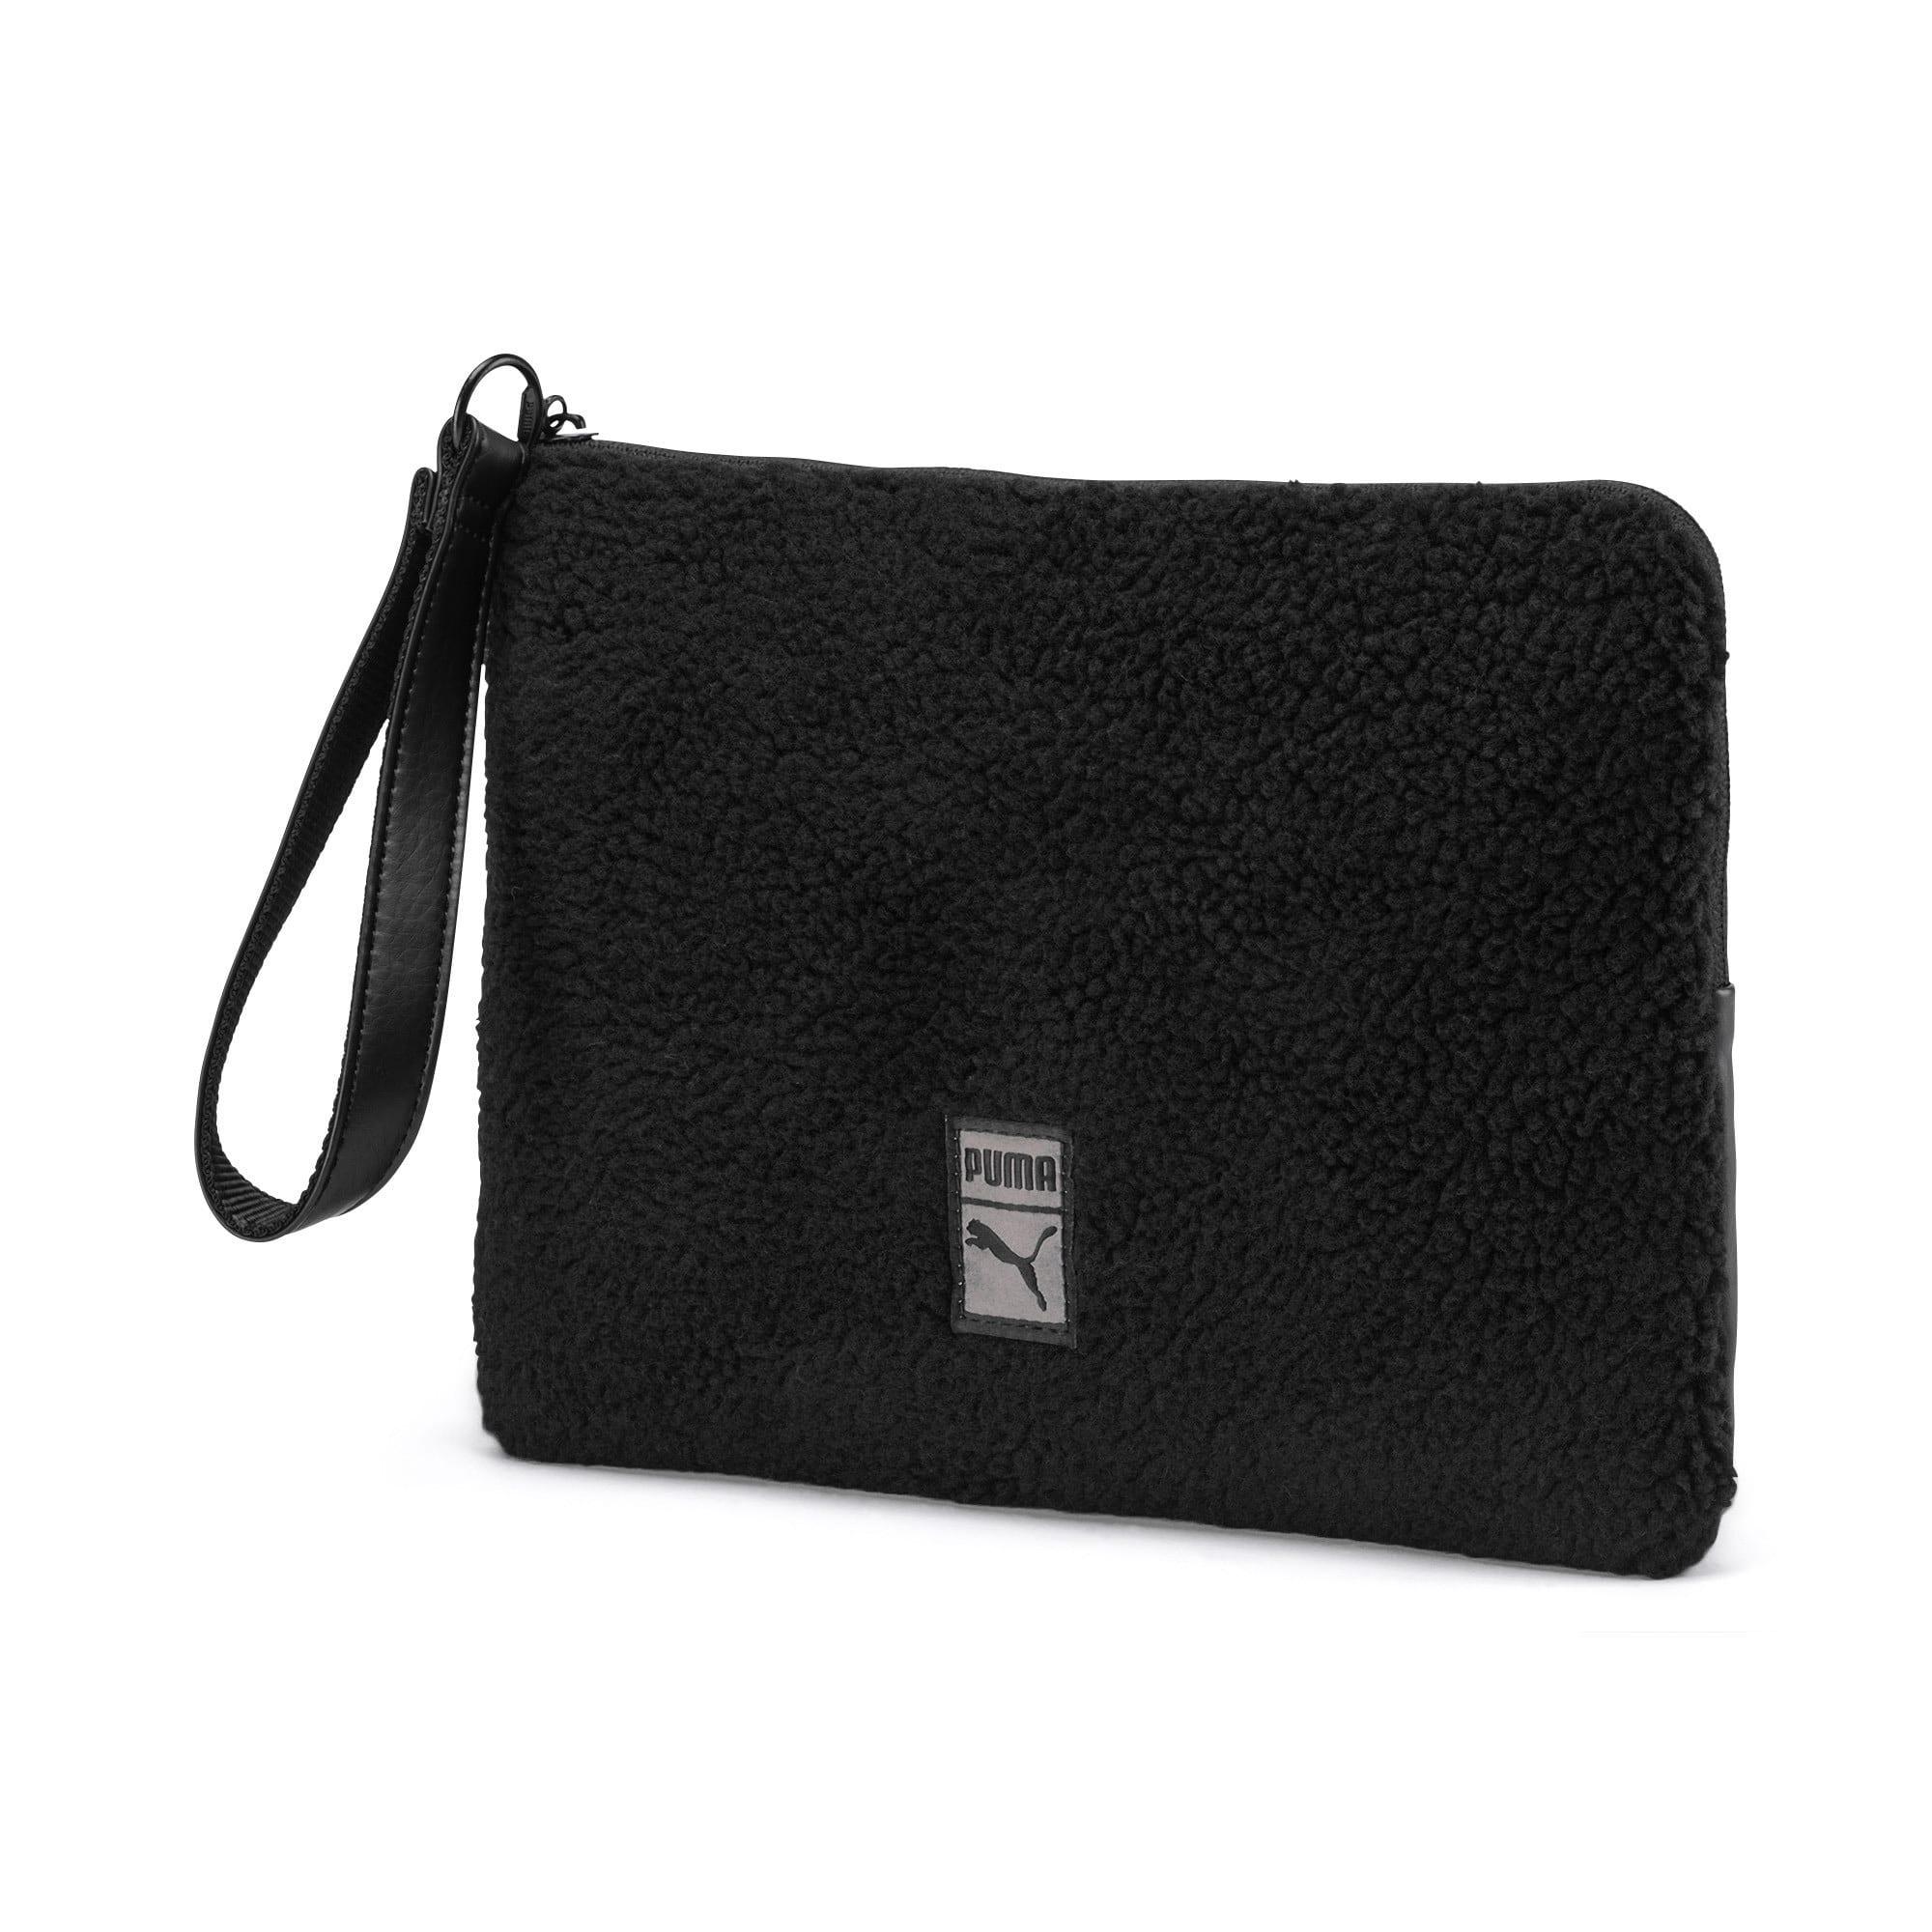 Thumbnail 1 of Prime Time Women's Clutch Bag, Puma Black-Puma Black, medium-IND